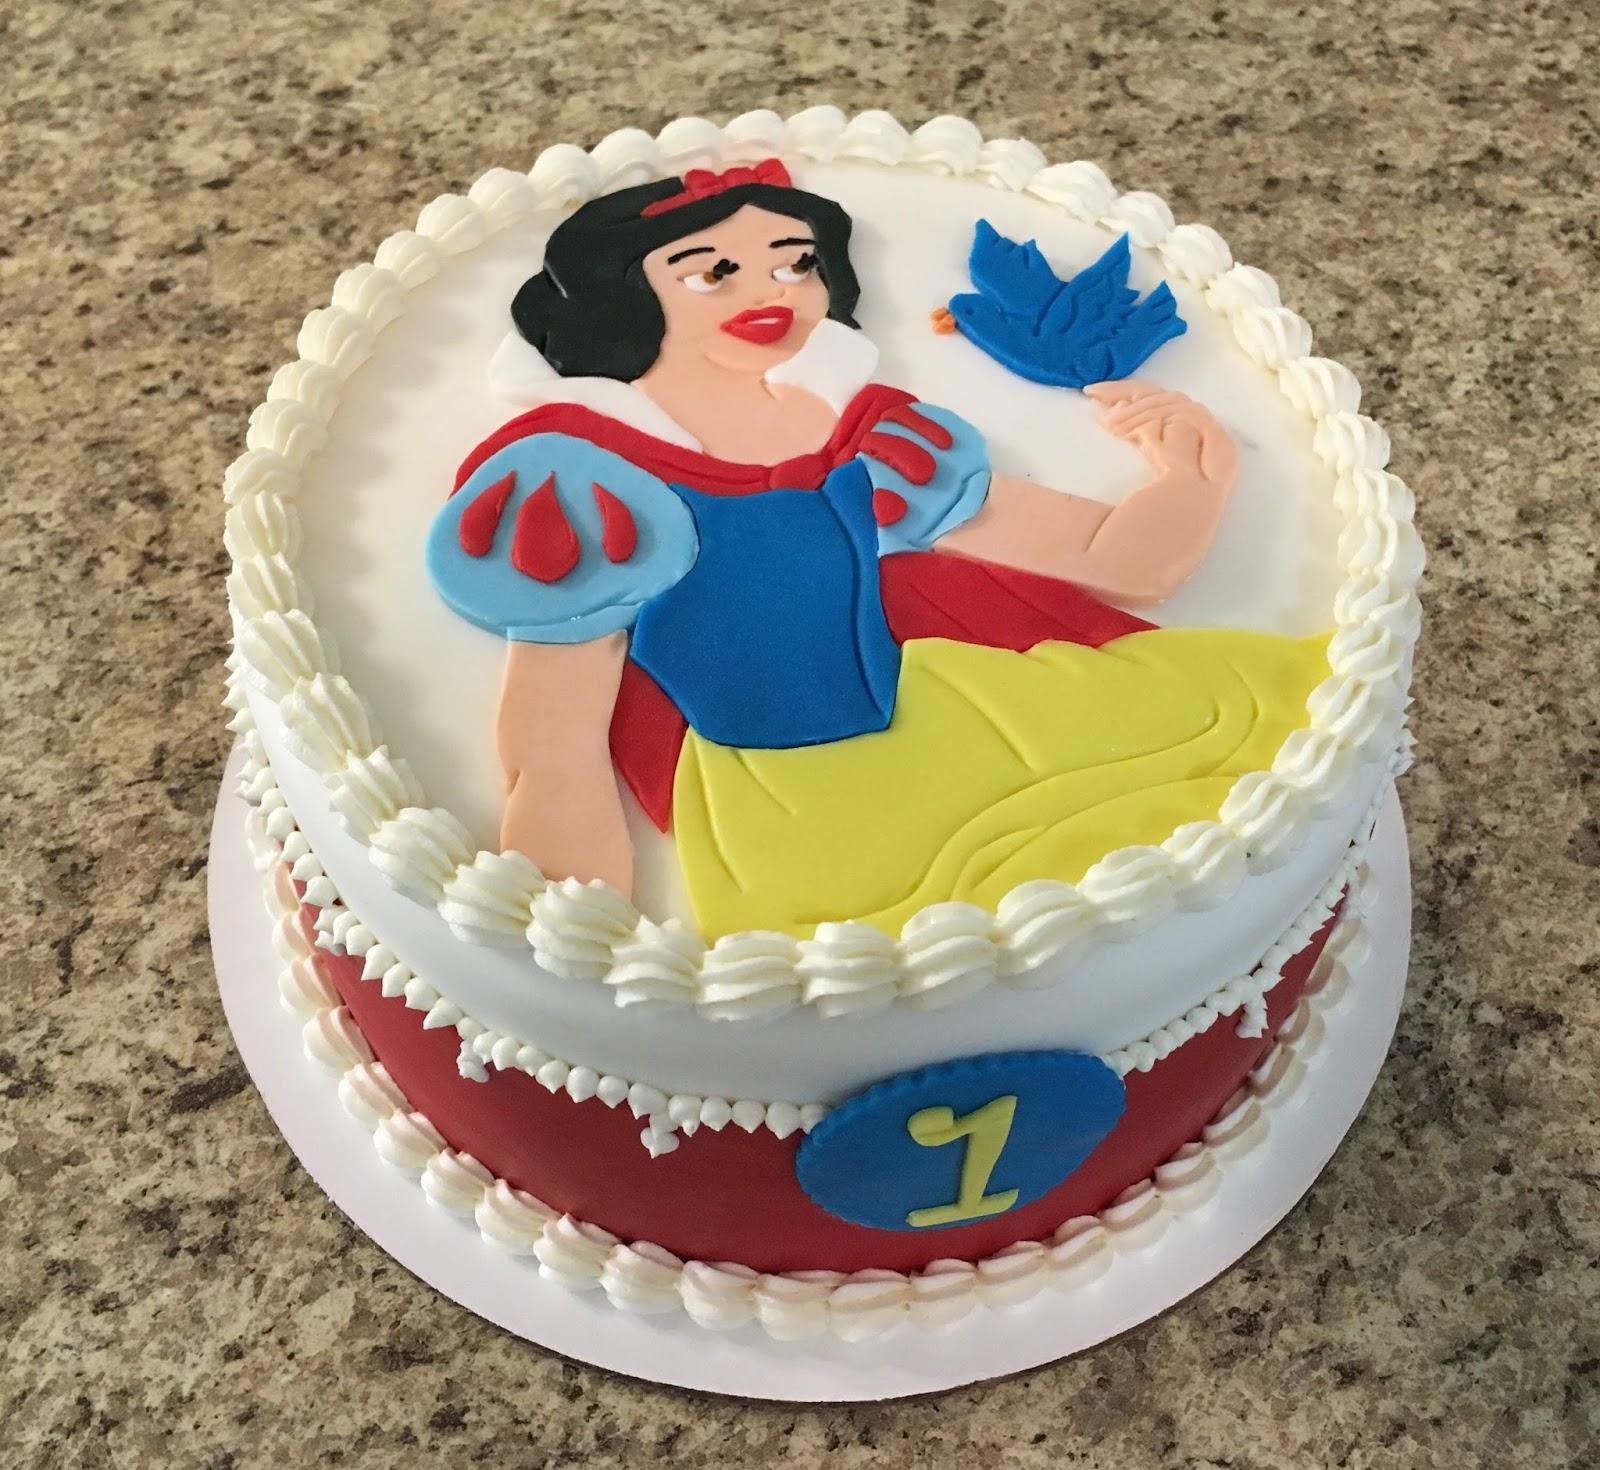 Astonishing Cakes By Becky Snow White First Birthday Funny Birthday Cards Online Alyptdamsfinfo